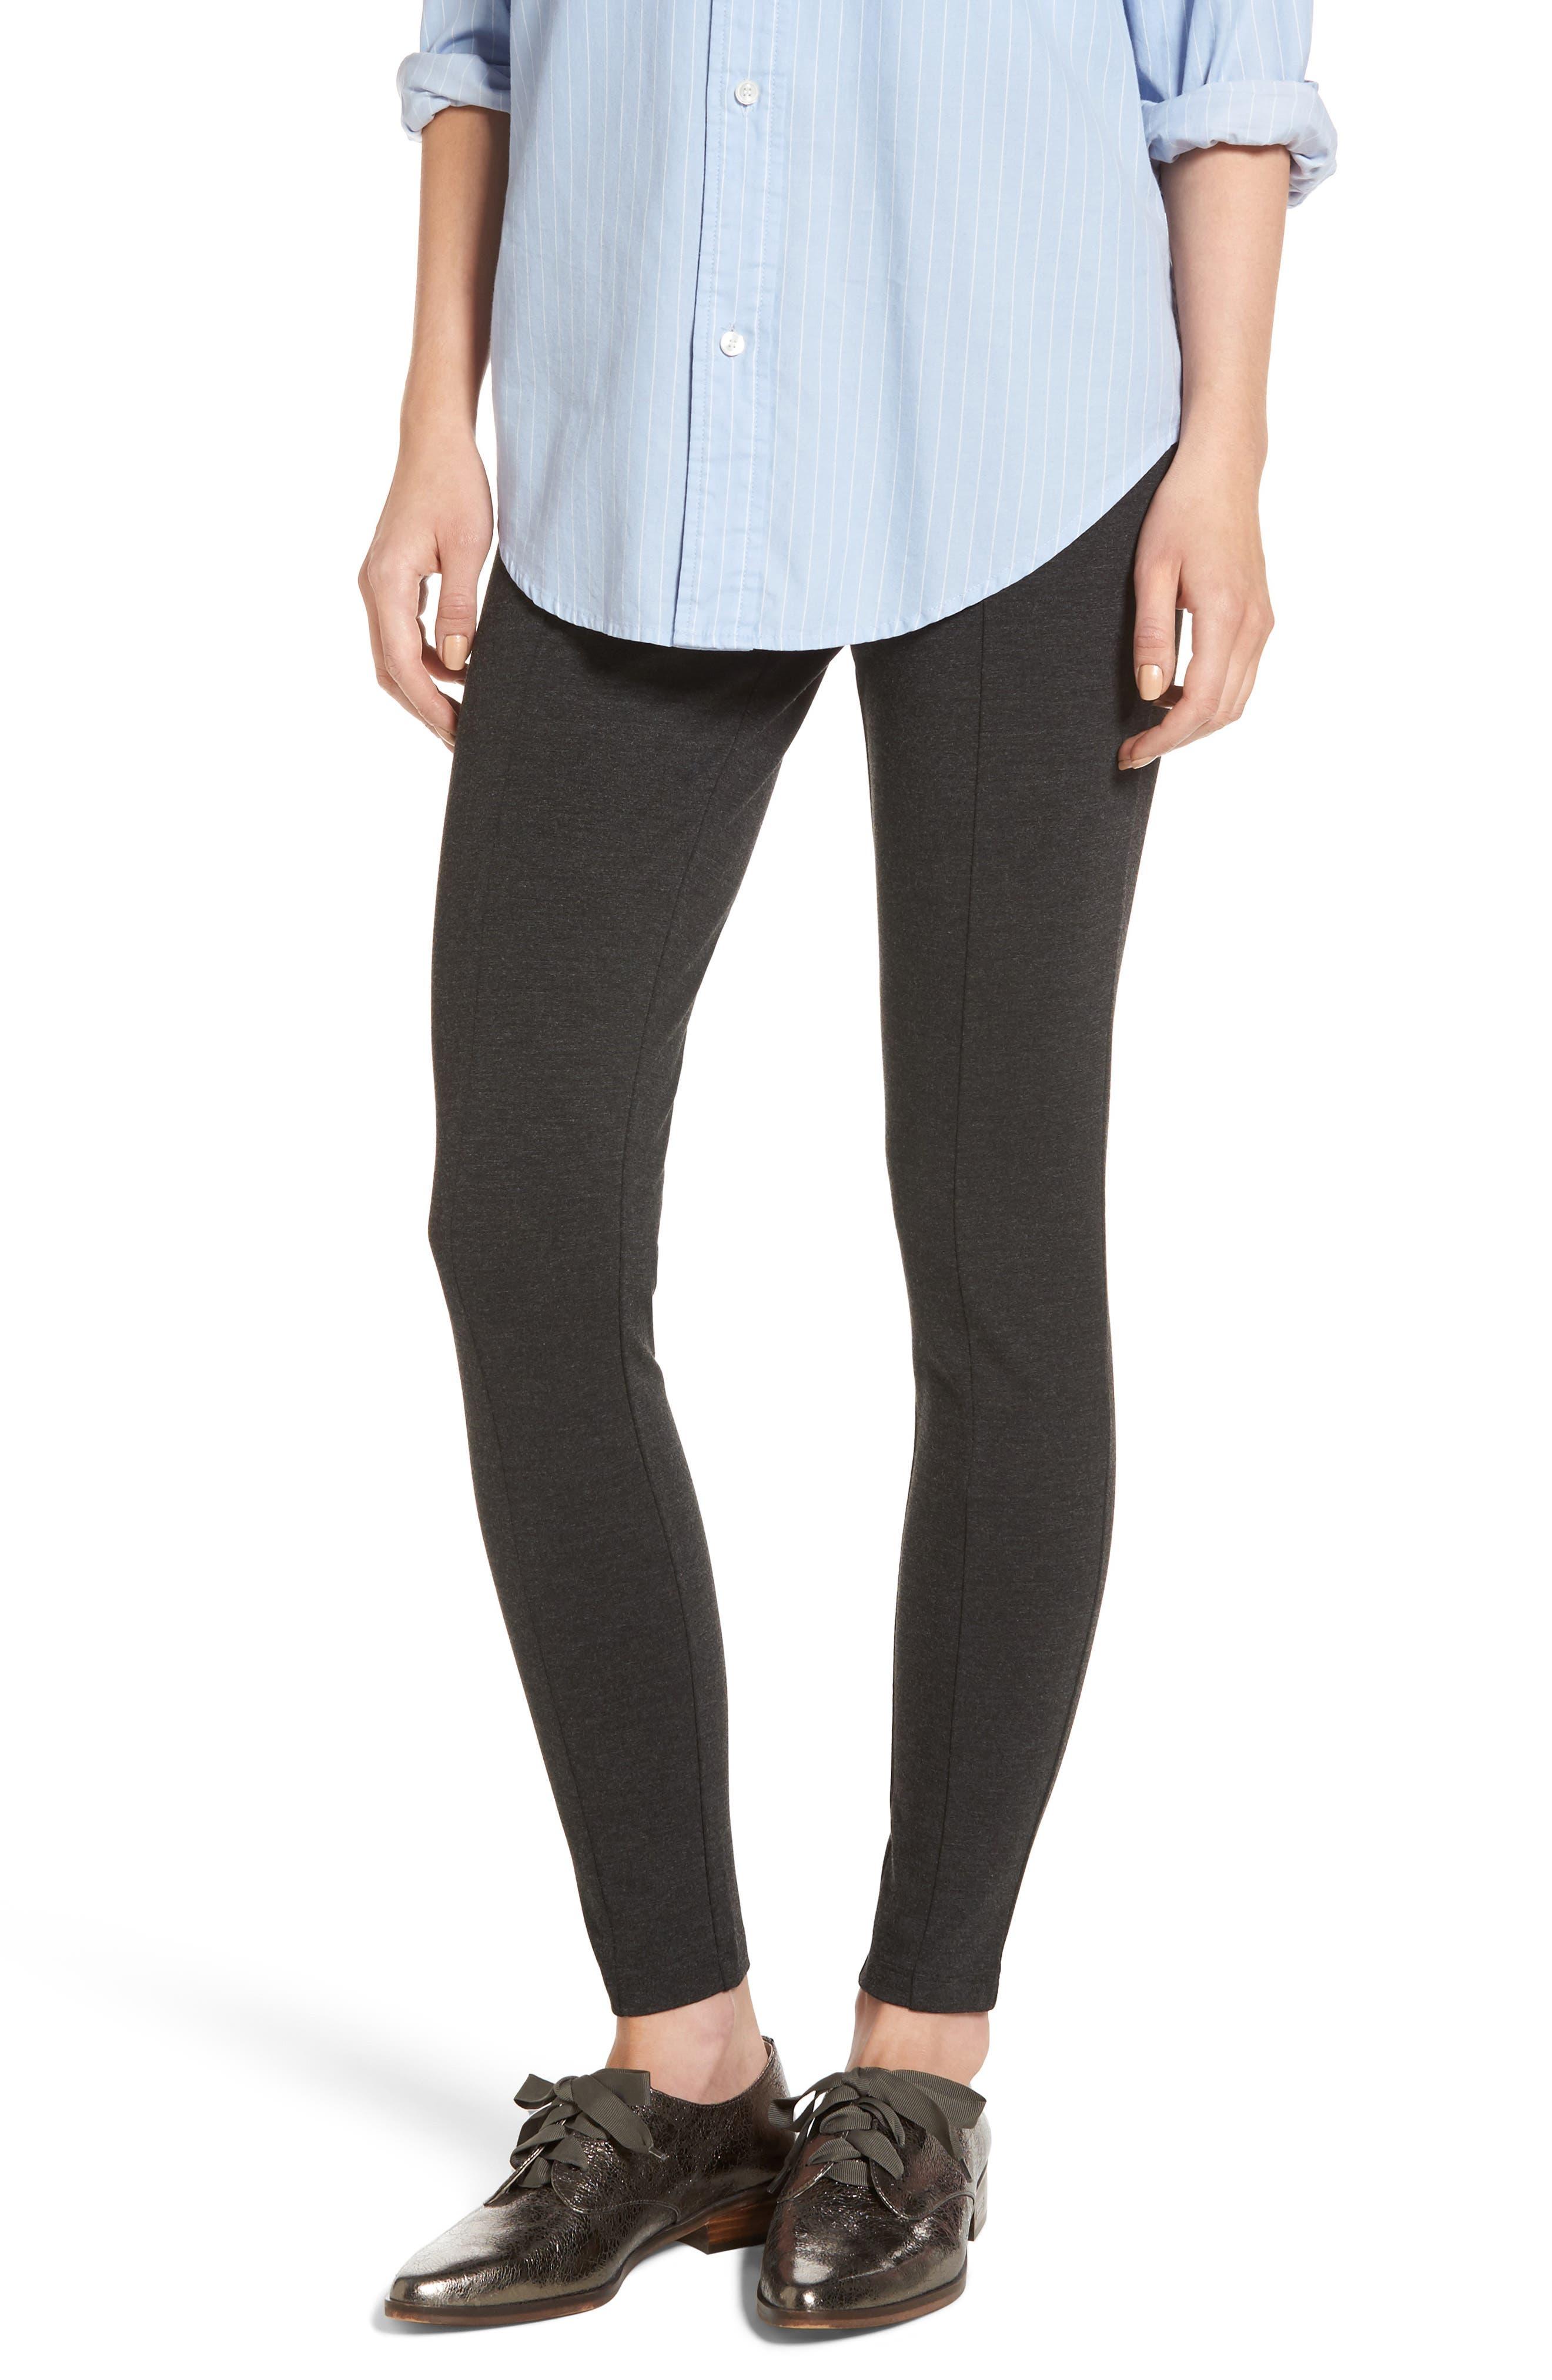 Main Image - Halogen® Seamed Ponte Knit Leggings (Regular & Petite)